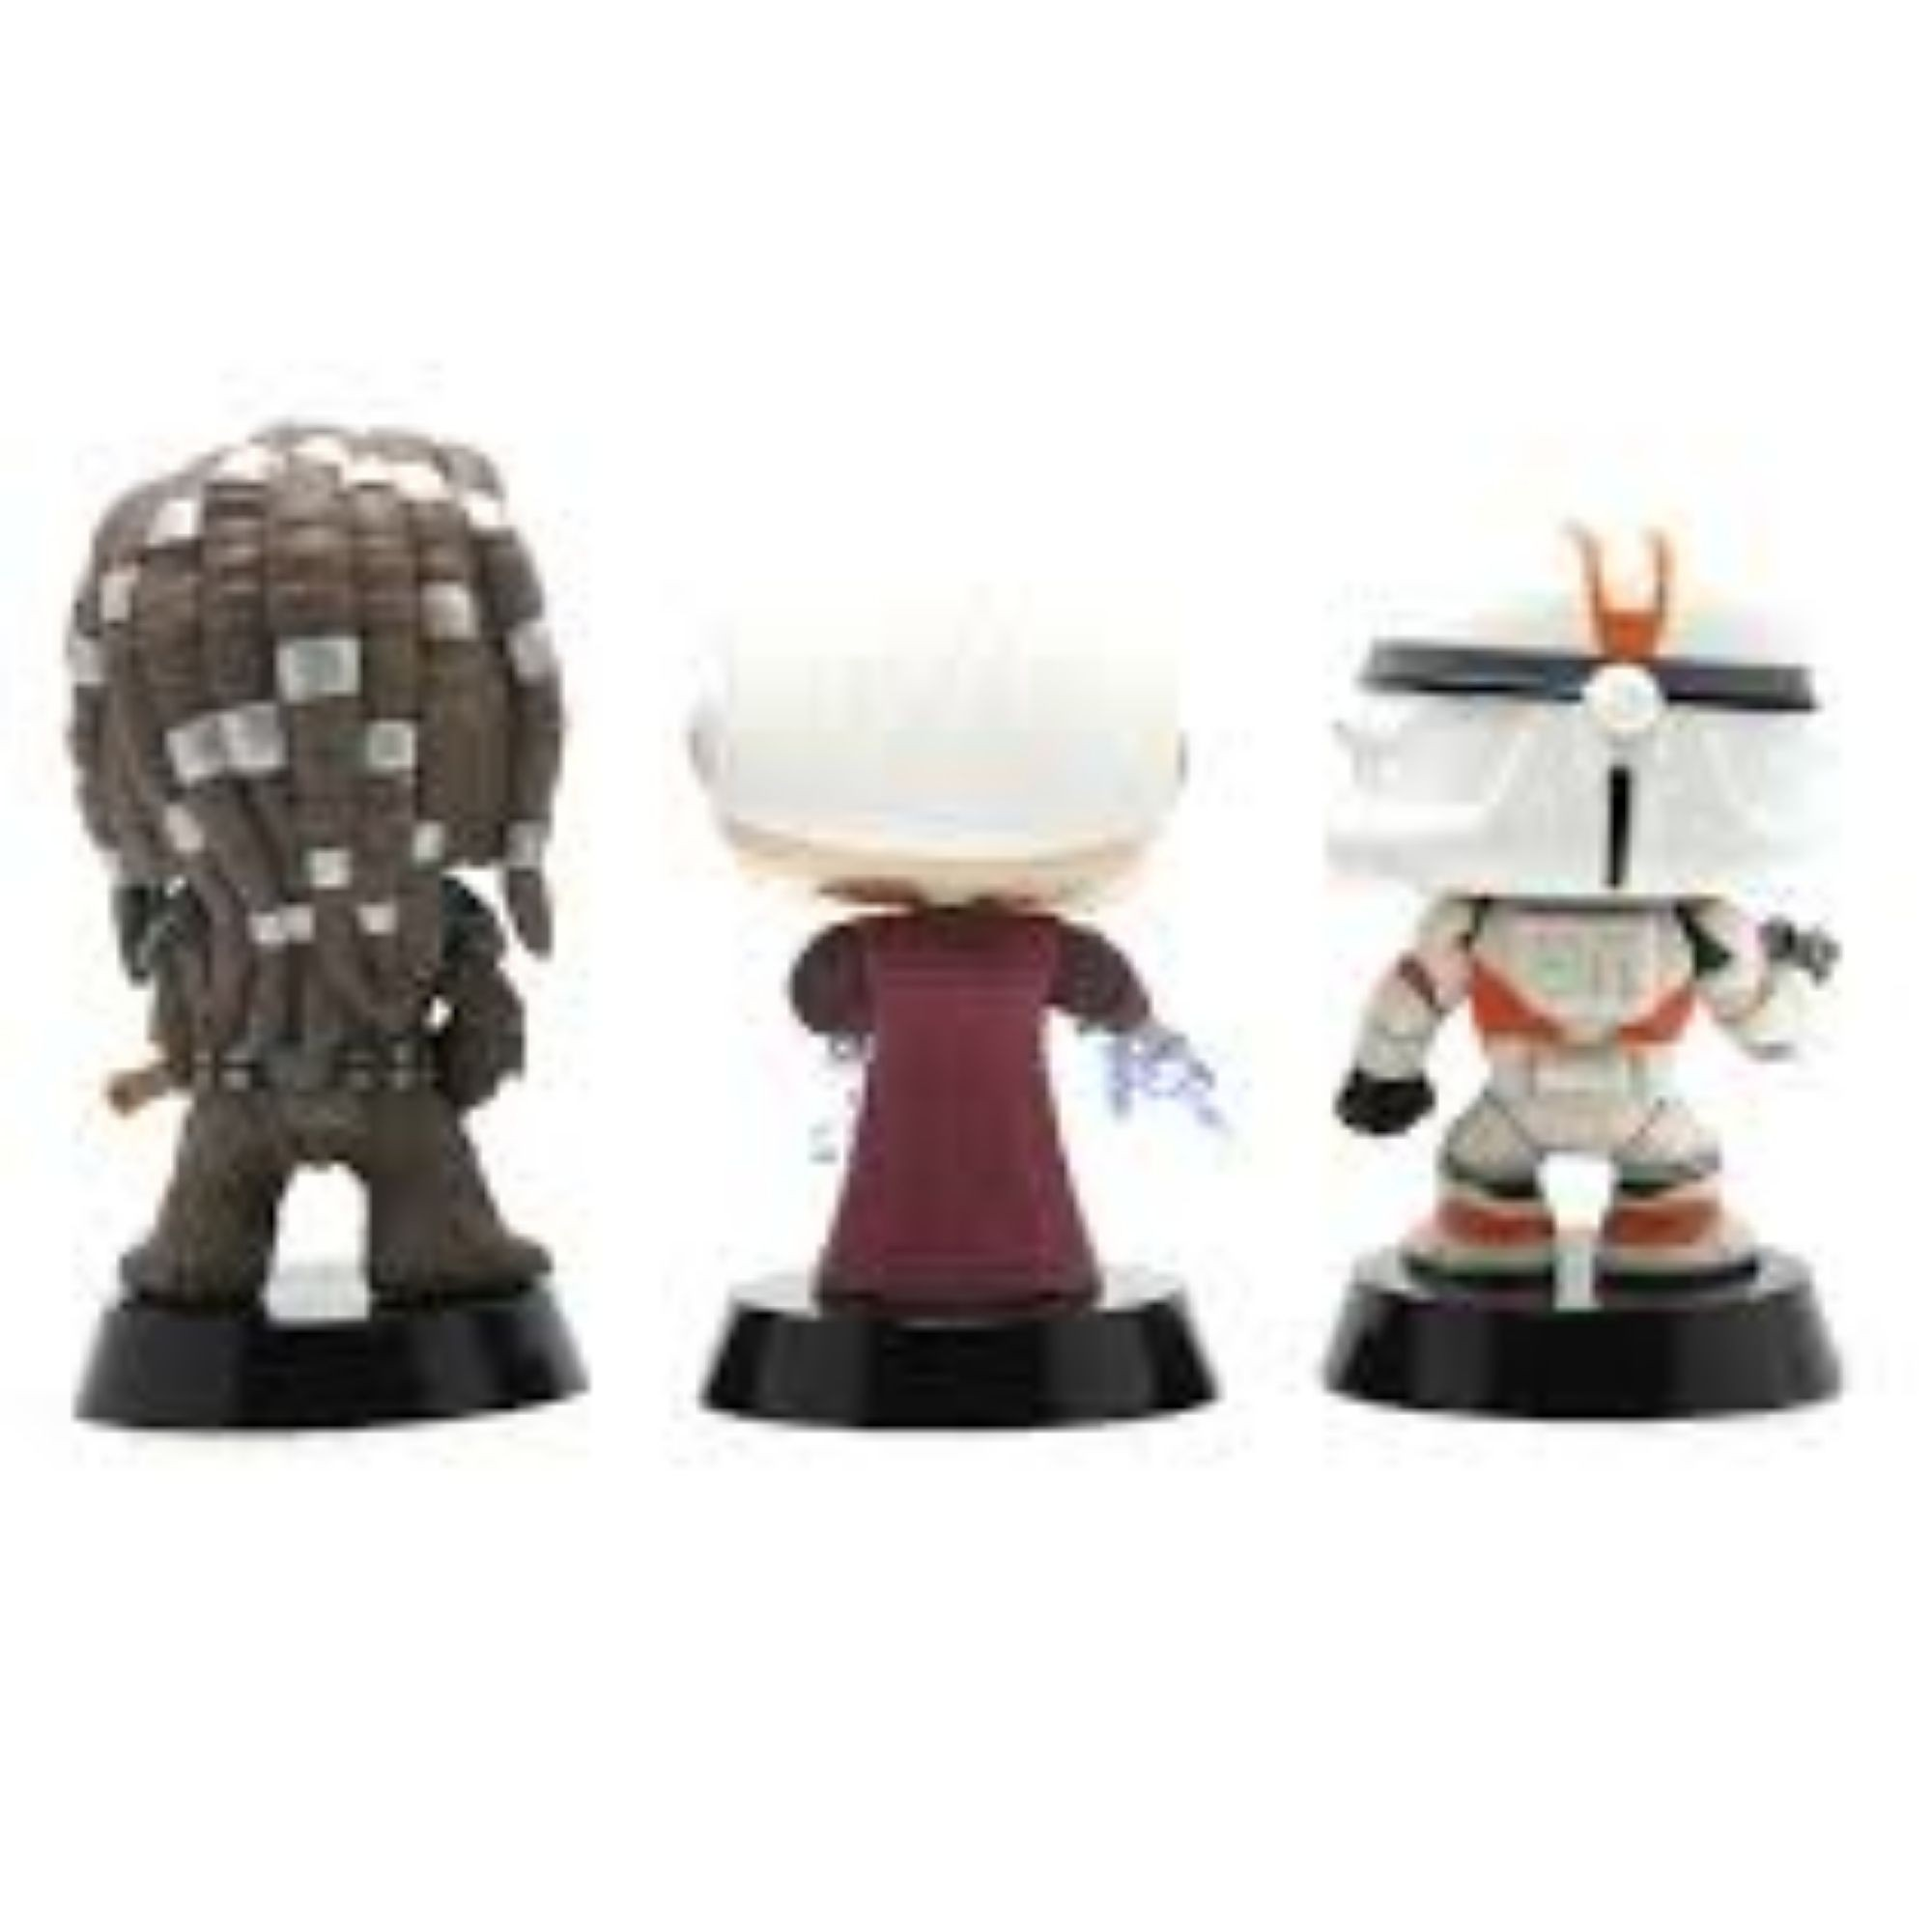 Funko Pop Star Wars Tarfful, Unhooded Emperor e Utapau Clone trooper   - Game Land Brinquedos